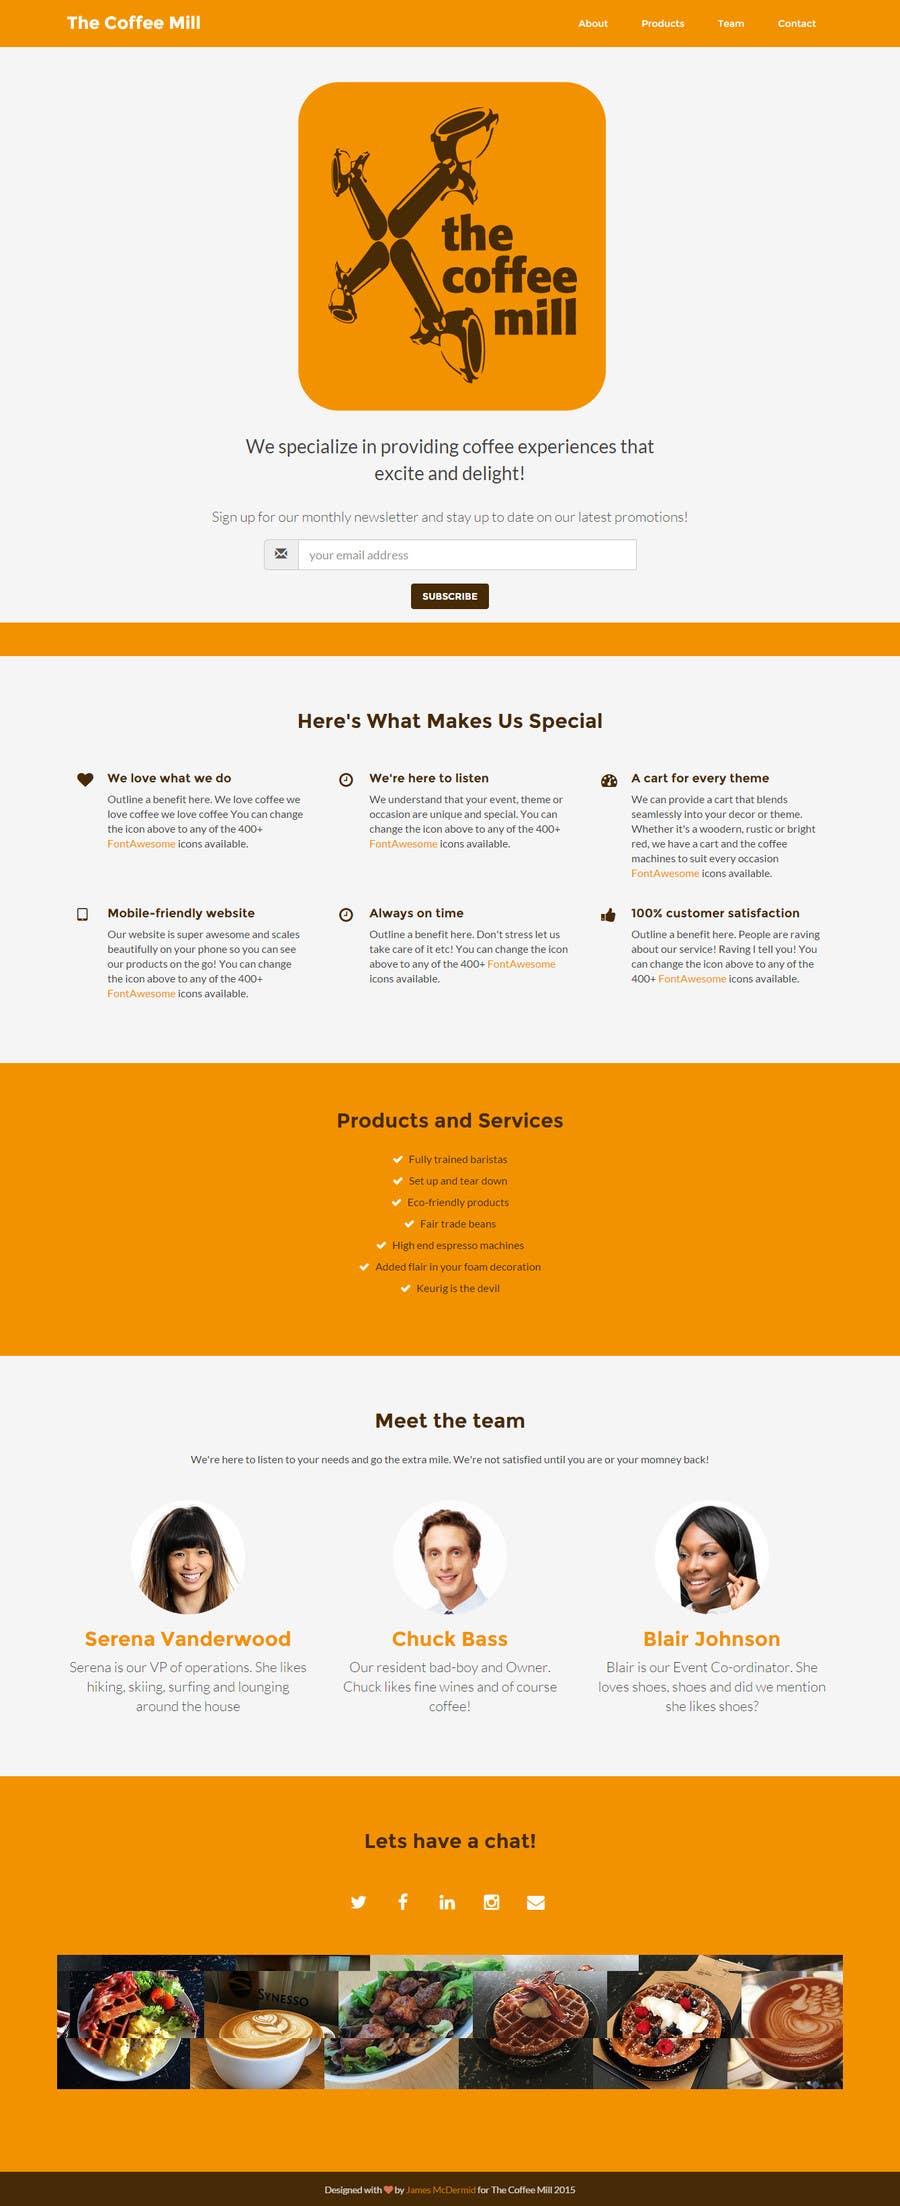 Konkurrenceindlæg #                                        6                                      for                                         Design a Website Mockup for a Mobile Coffee Business